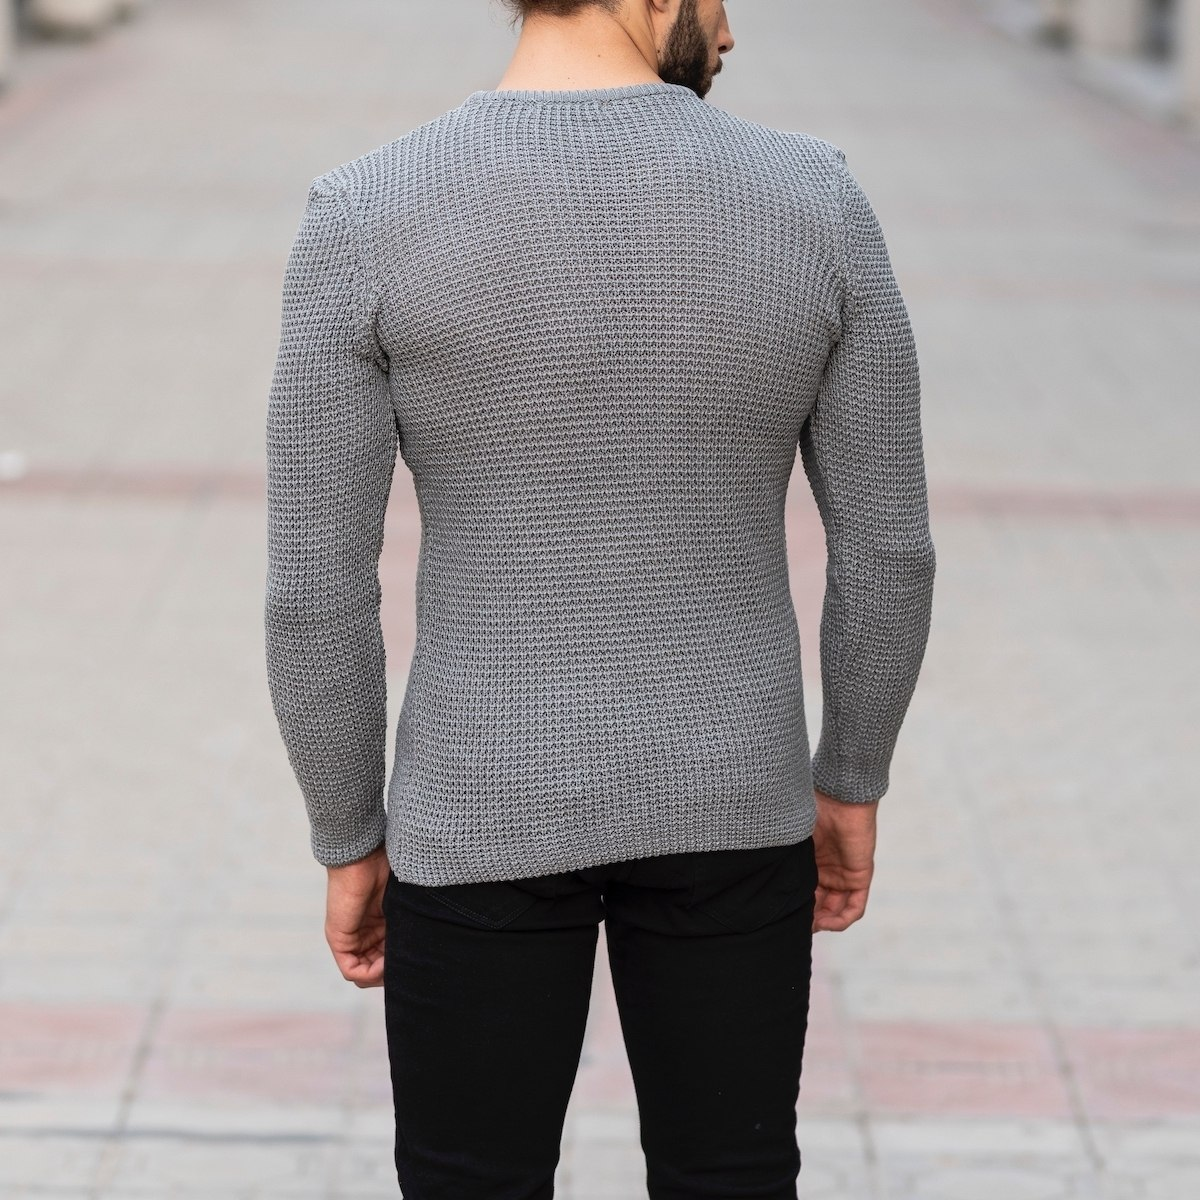 Knitted Pullover In Gray Mv Premium Brand - 4